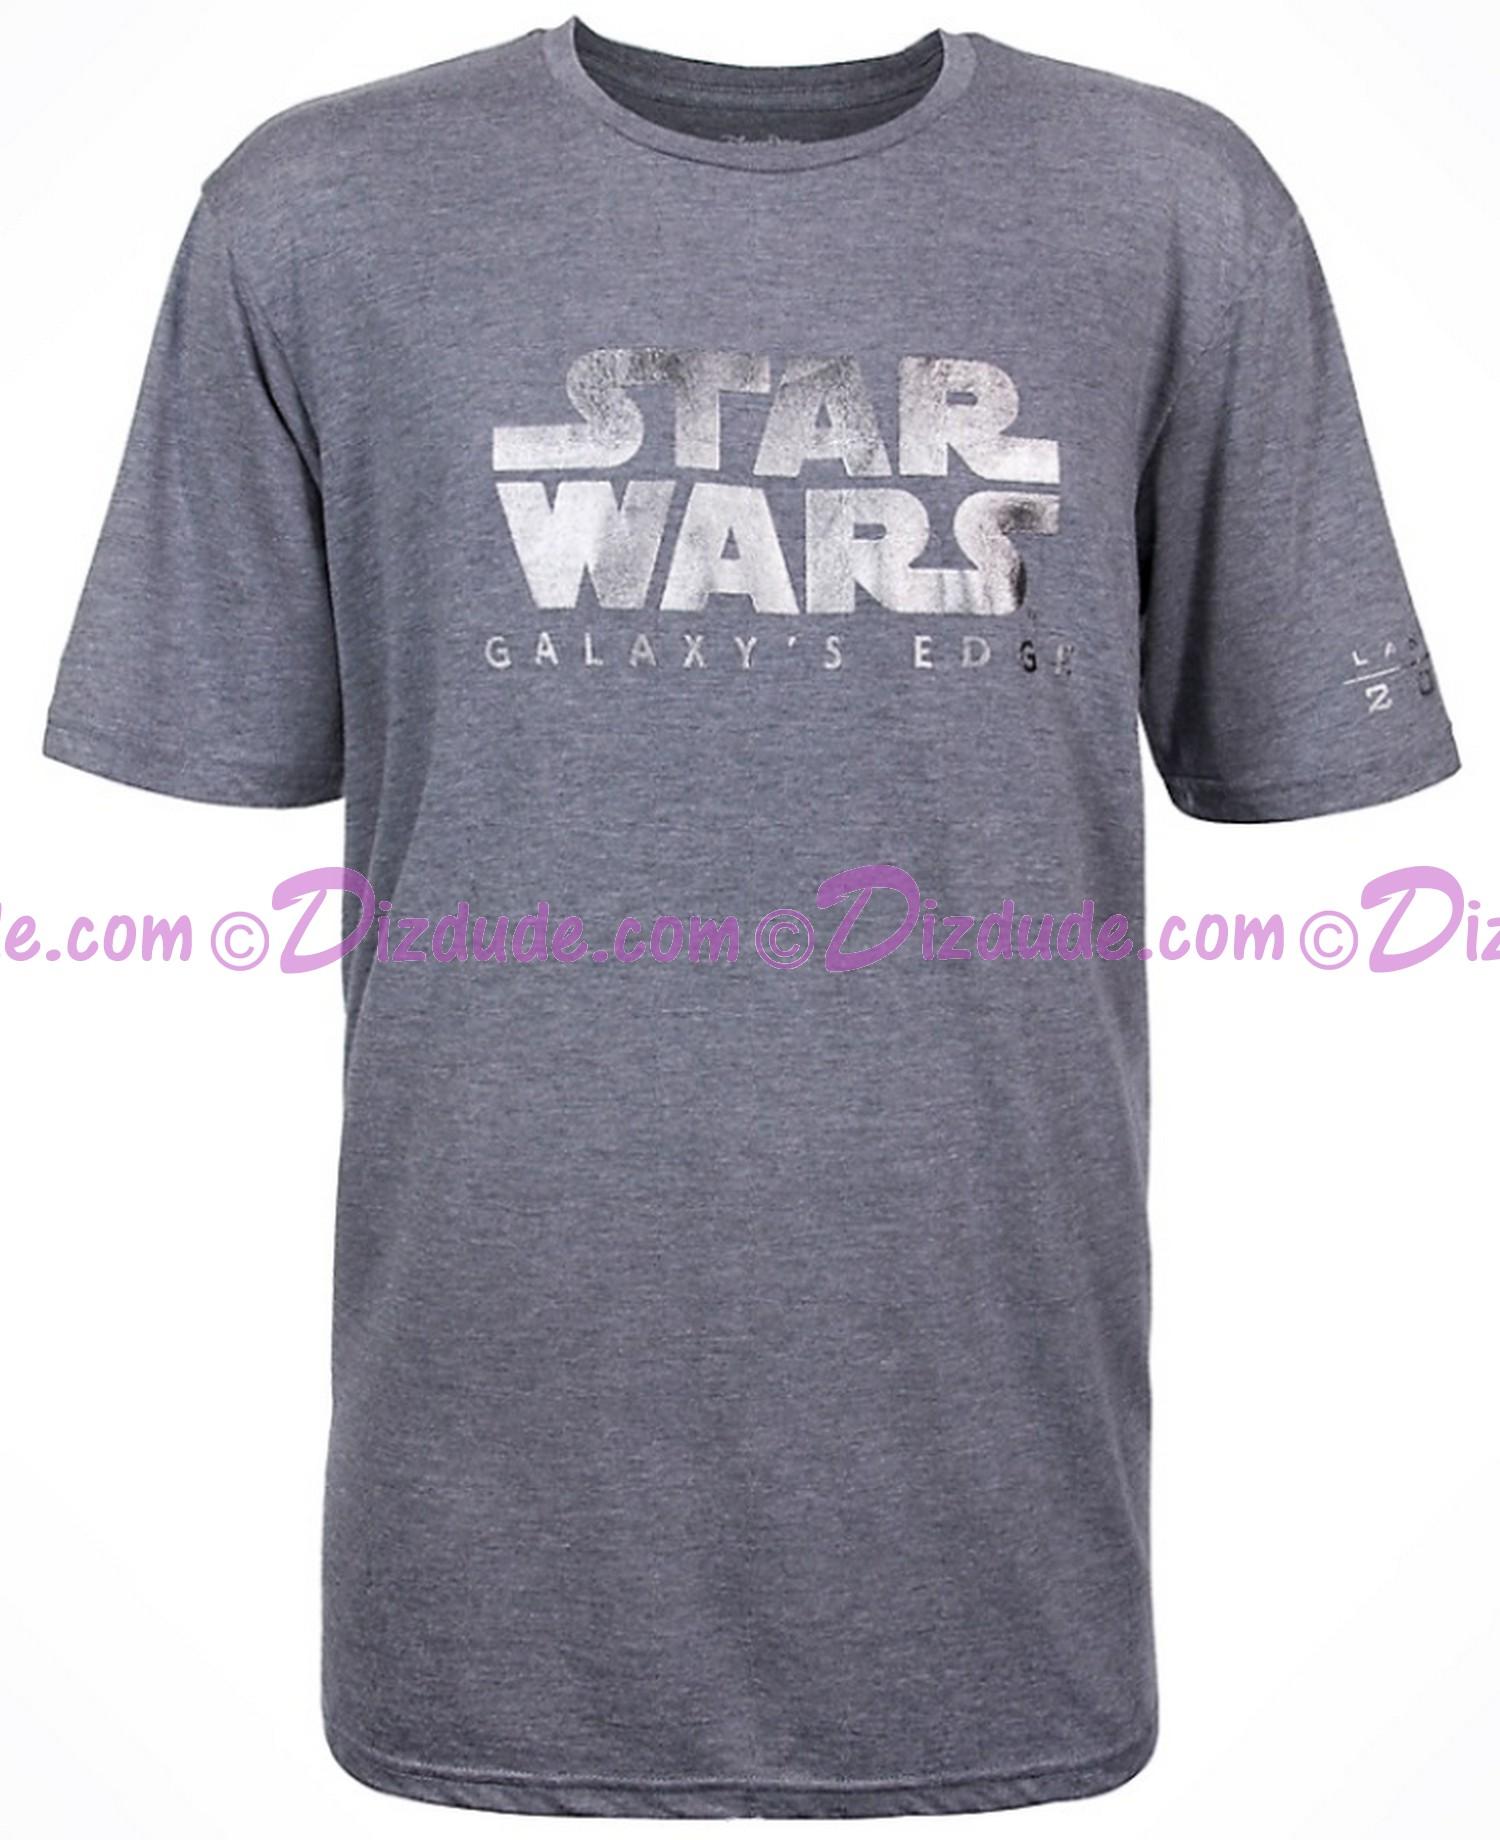 Disney Star Wars Galaxy's Edge Adult T-Shirt (Tshirt, T shirt or Tee) © Dizdude.com